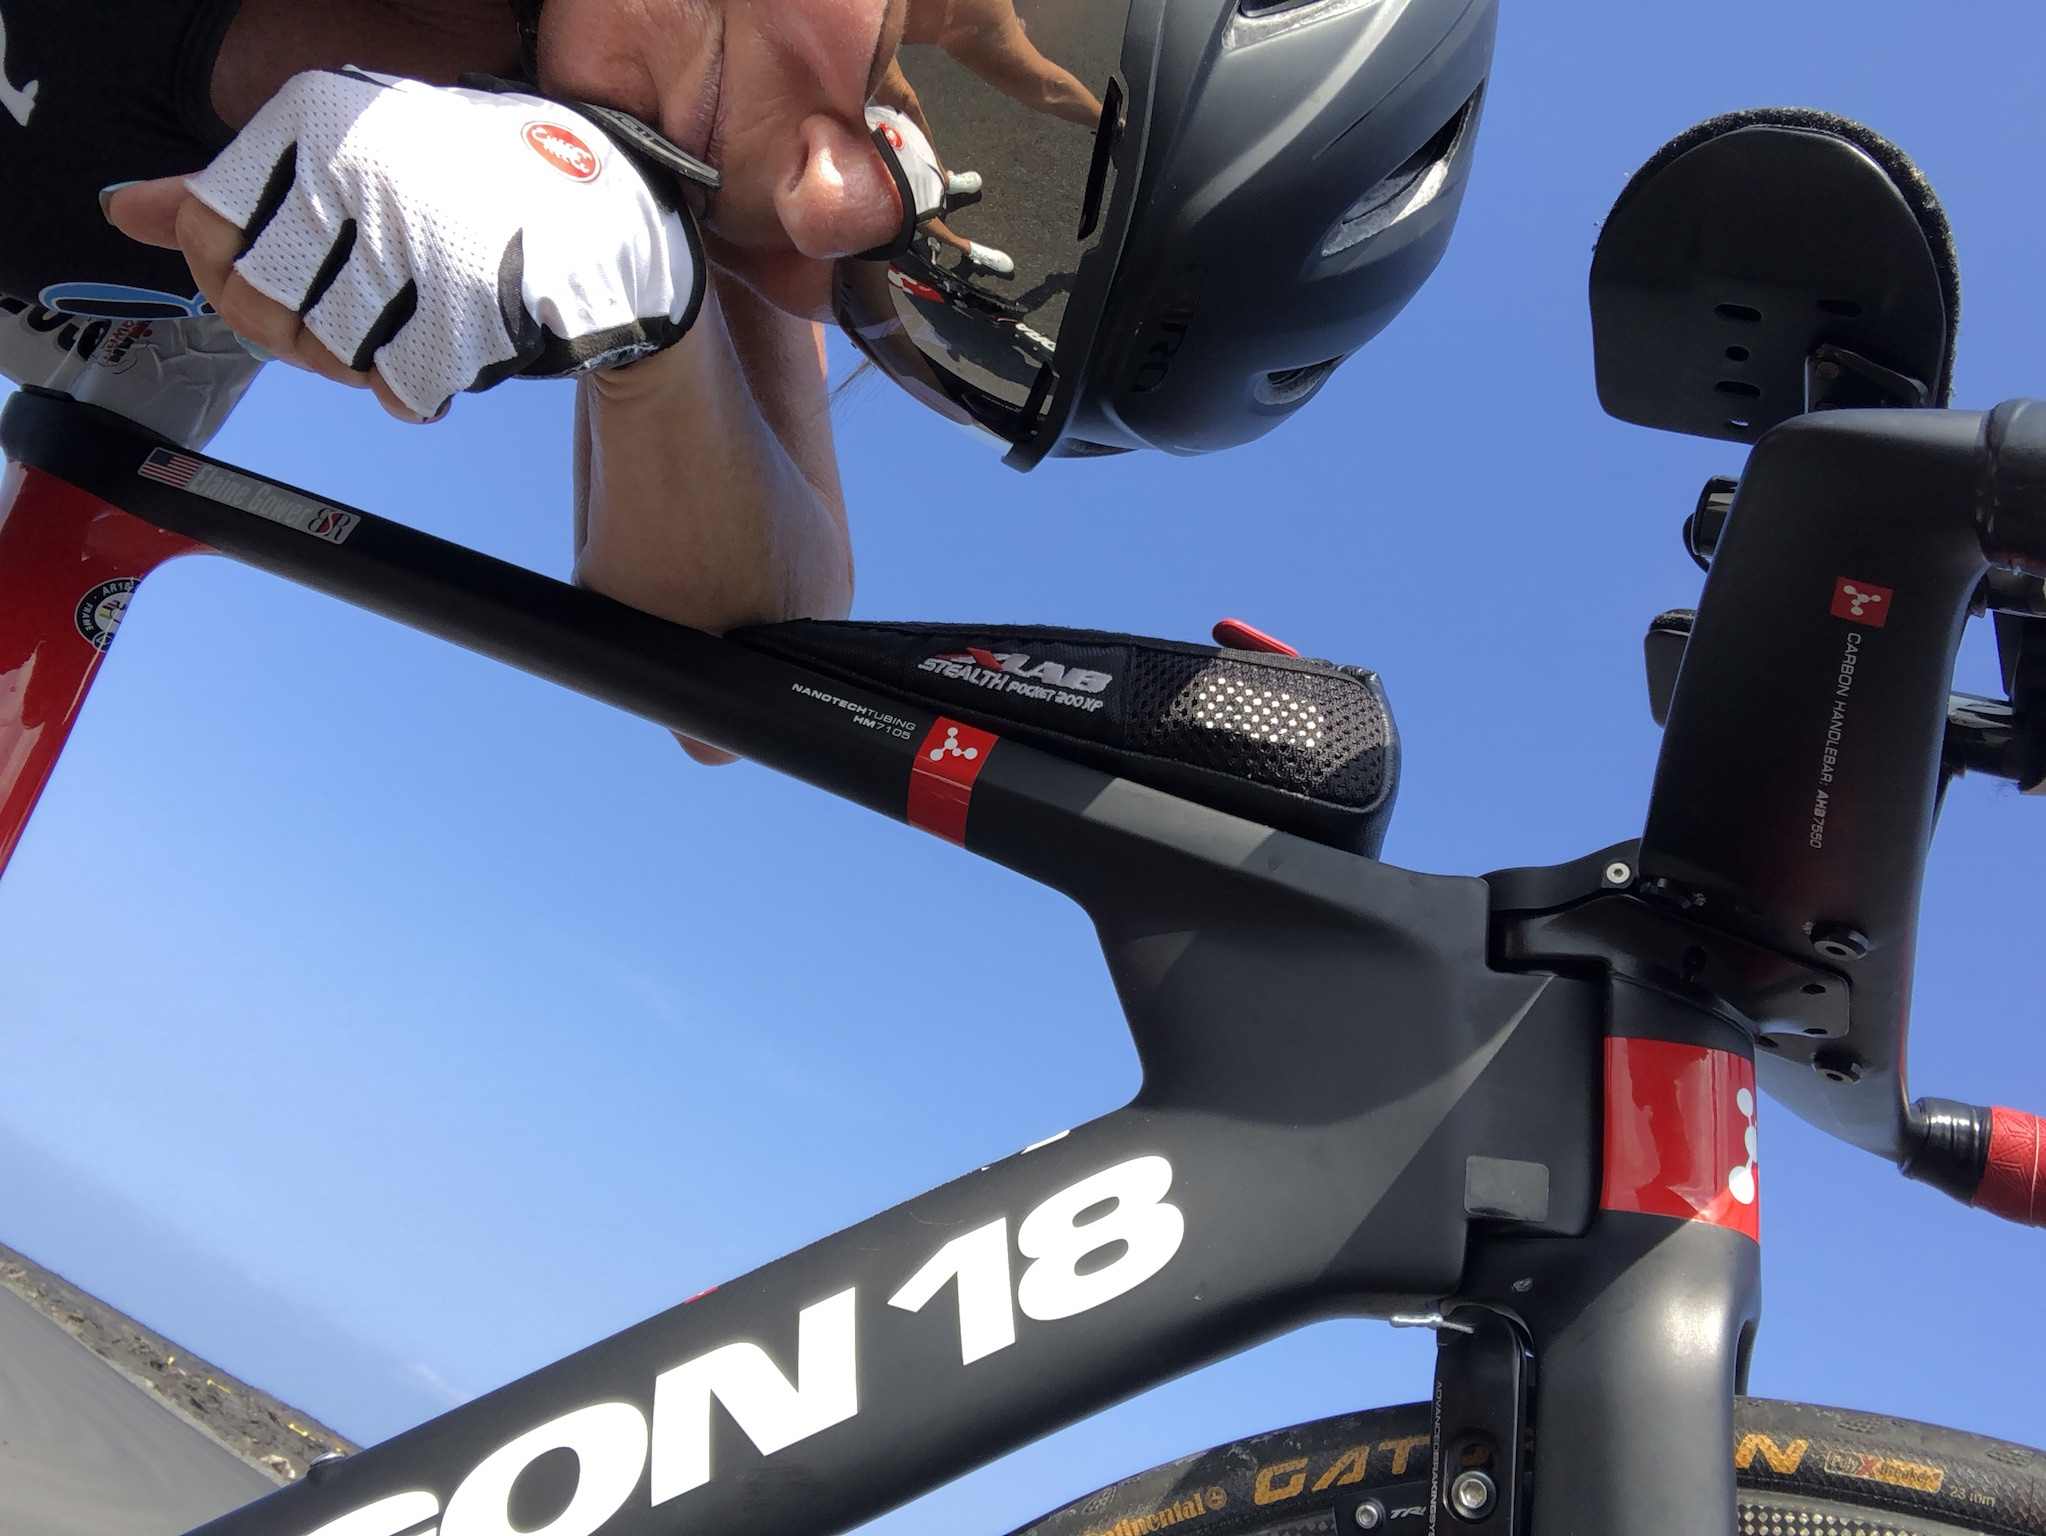 Coach_Terry_Wilson_Elaine_Gower_Ironman_Hawaii_70.3_Bike.jpeg